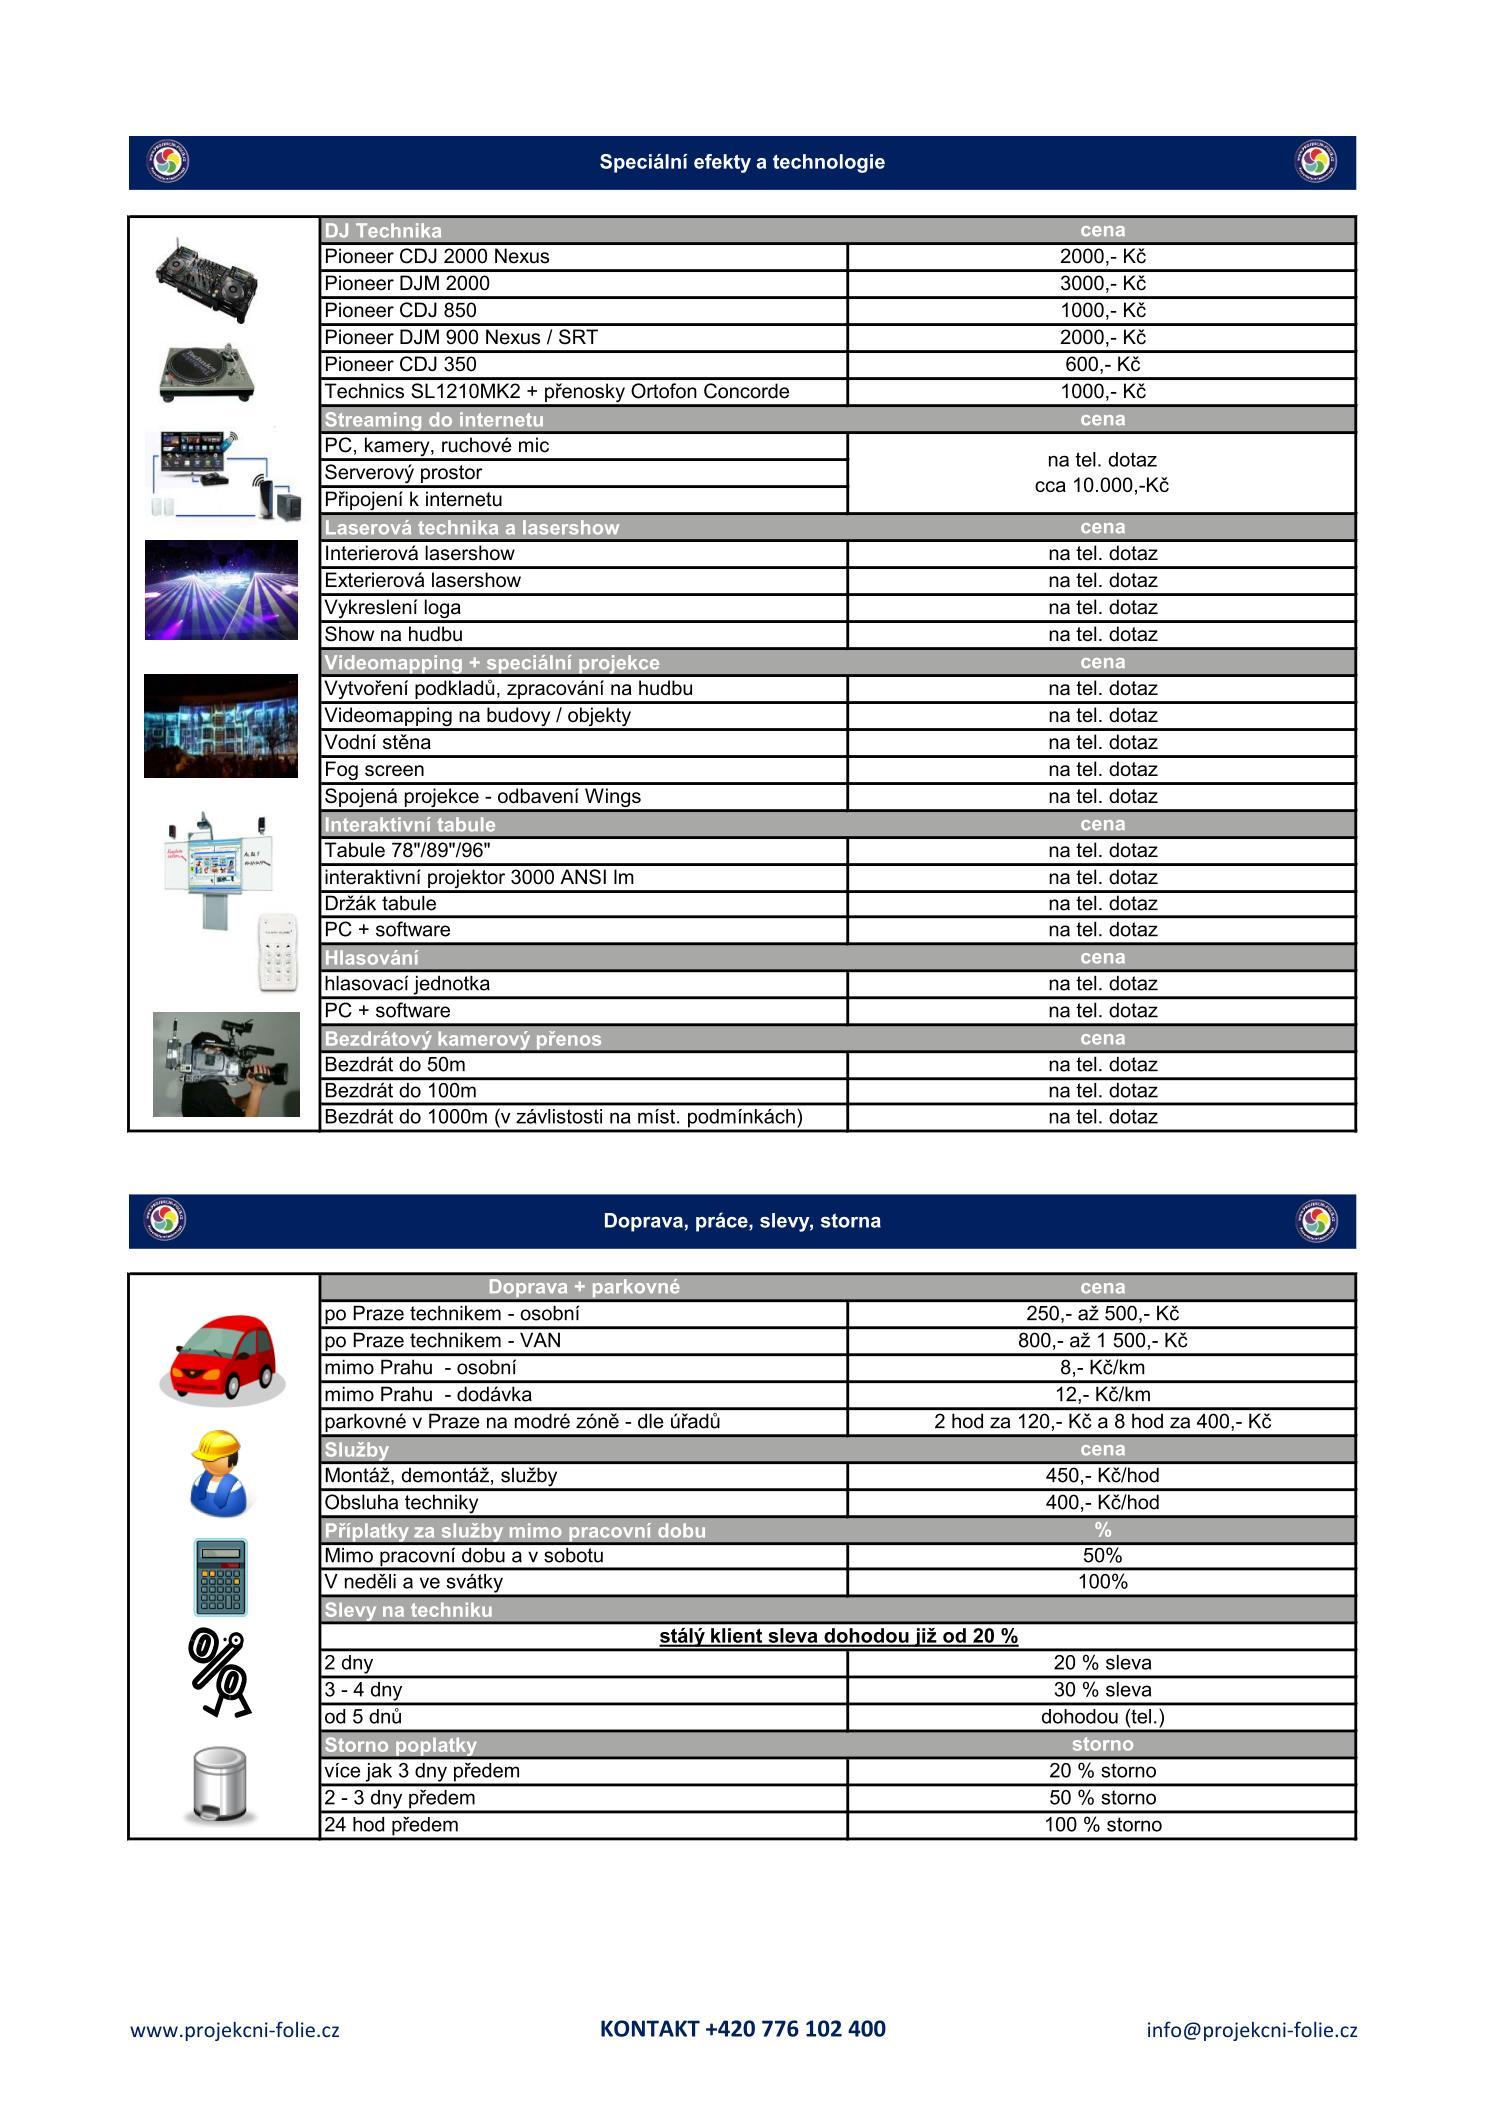 Pronájem AV techniky - str4